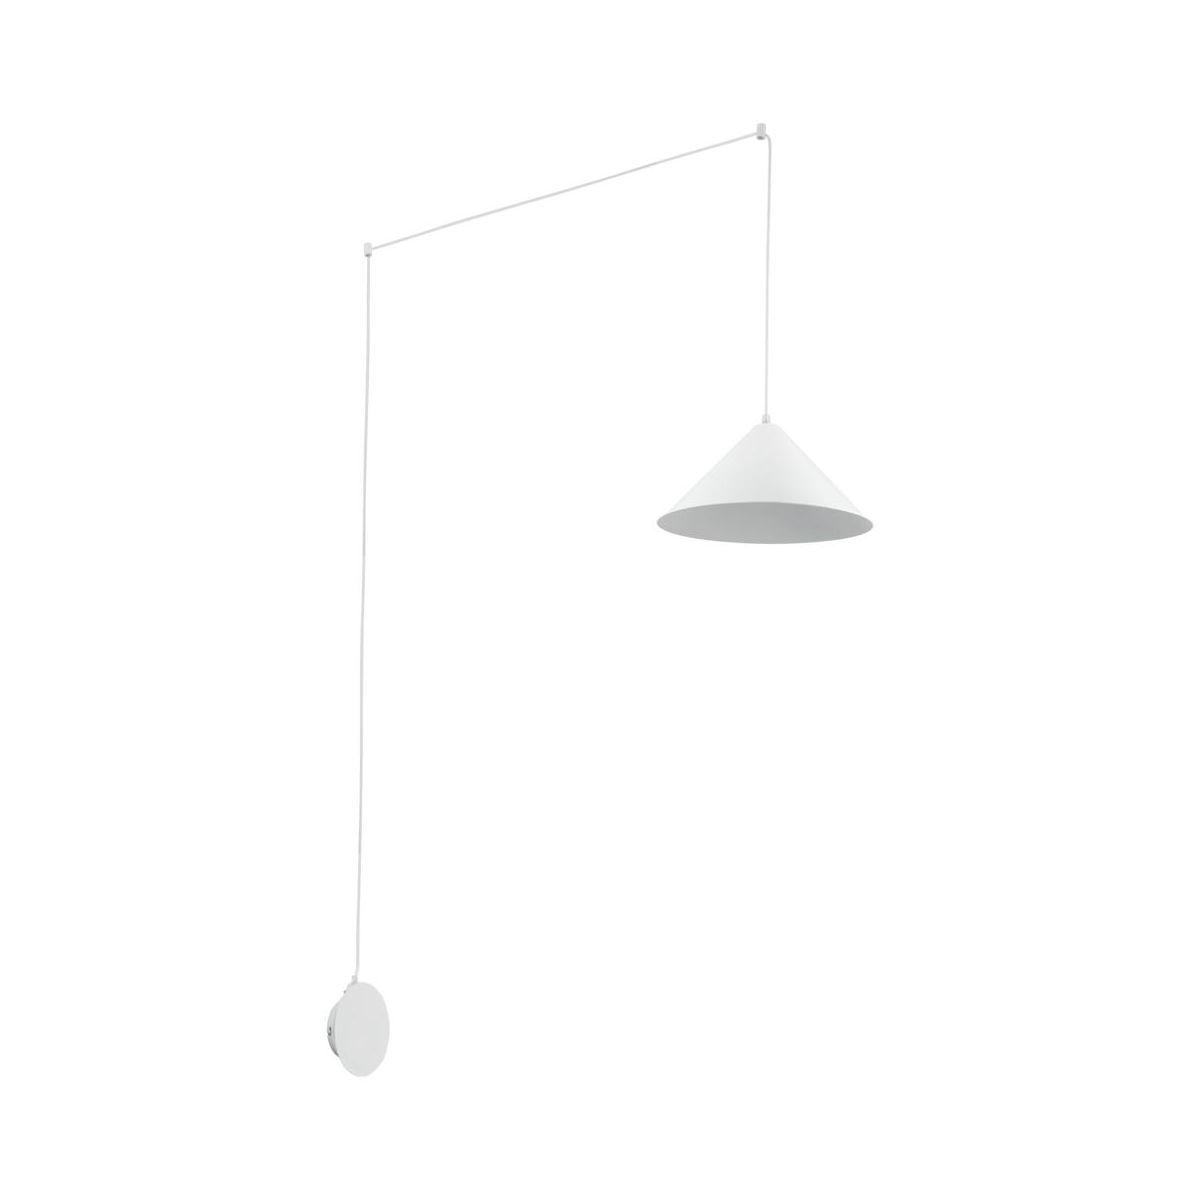 Lampa wisząca SOMERSET biała ruchoma E27 INSPIRE   Lampa